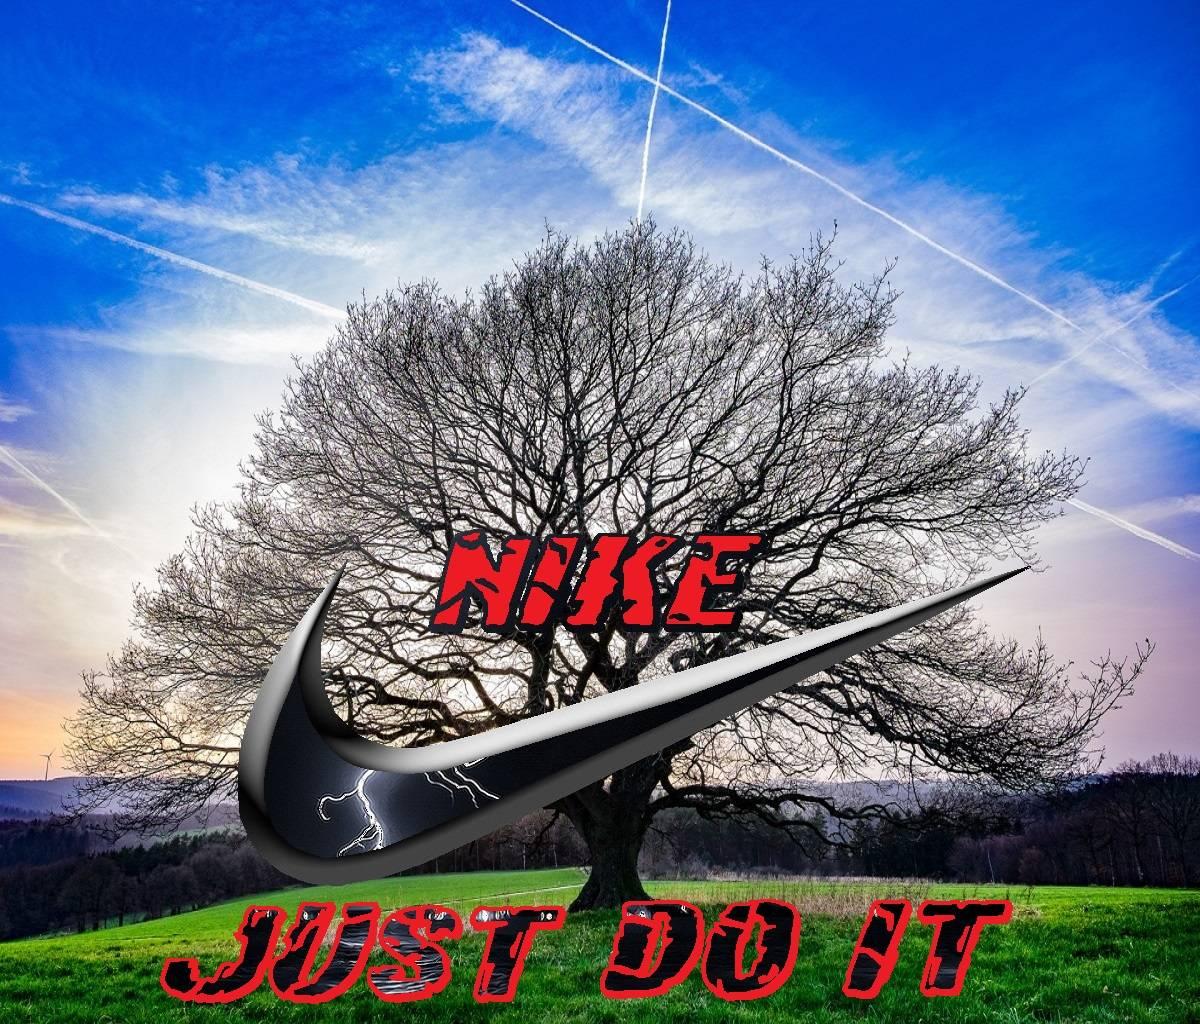 The Tree of Nike